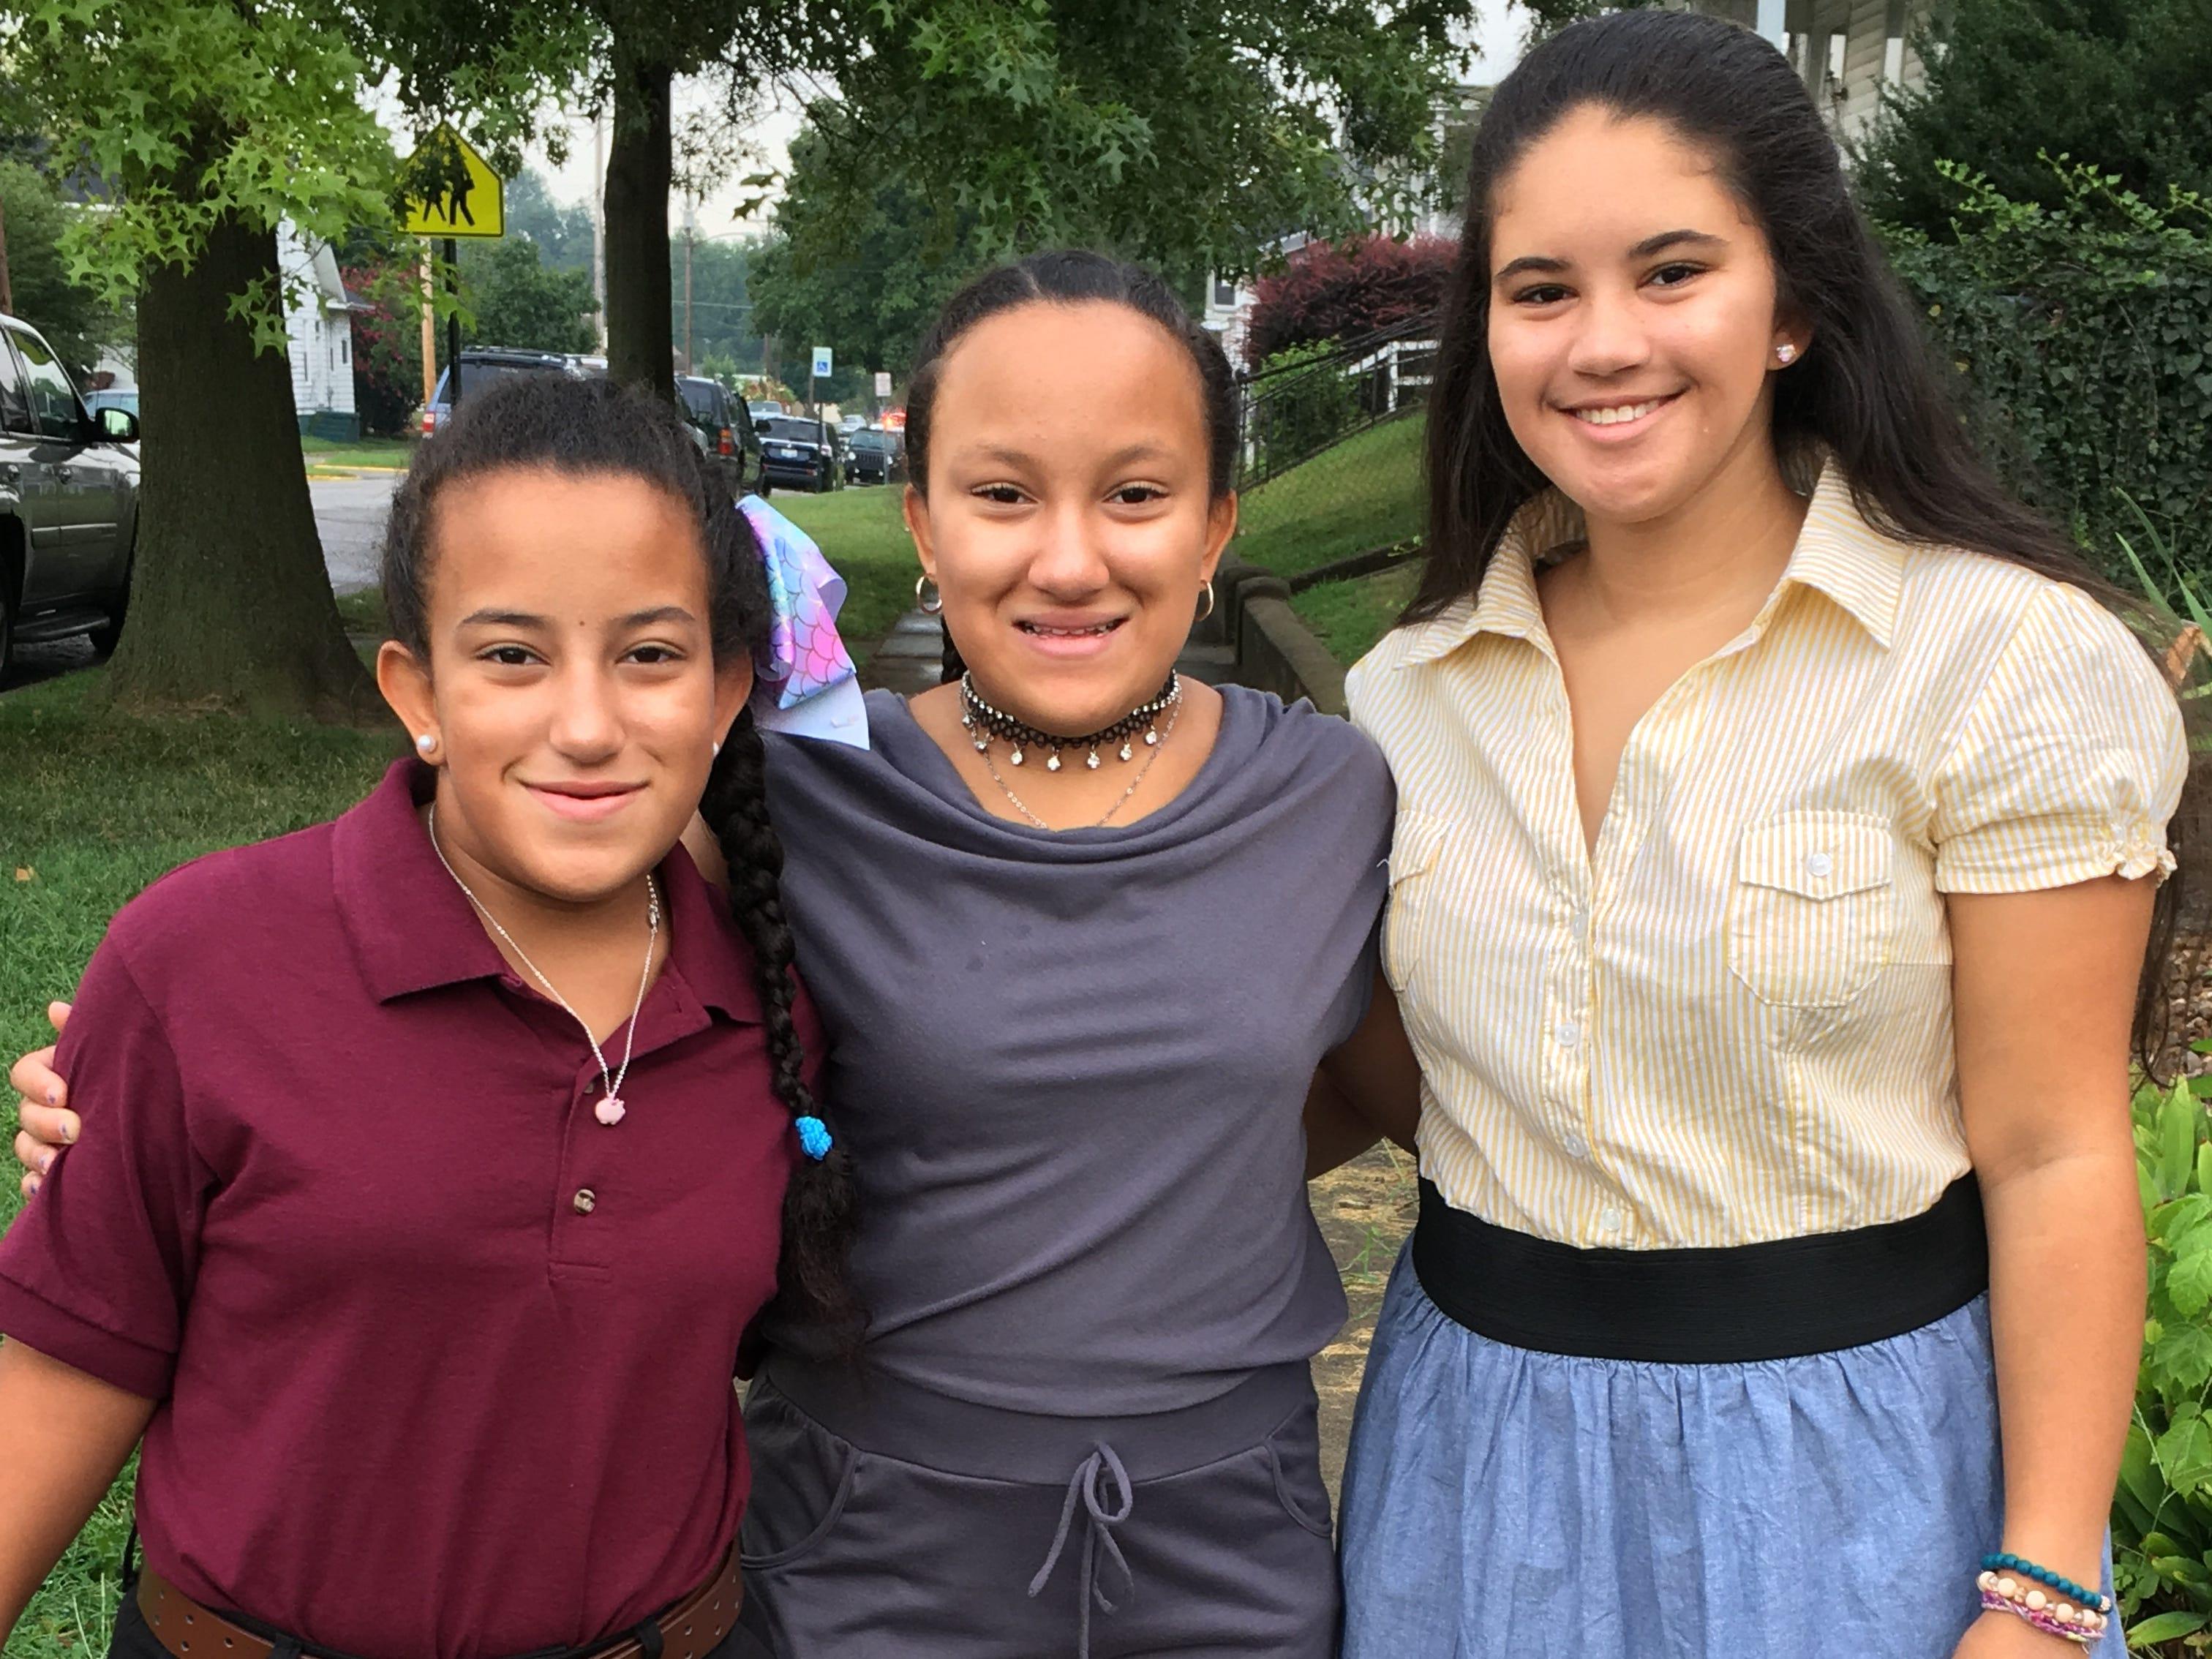 Alexis Purdy, kindergarten aide. Kaleigh Purdy, sophomore. Miranda Purdy, seventh grade